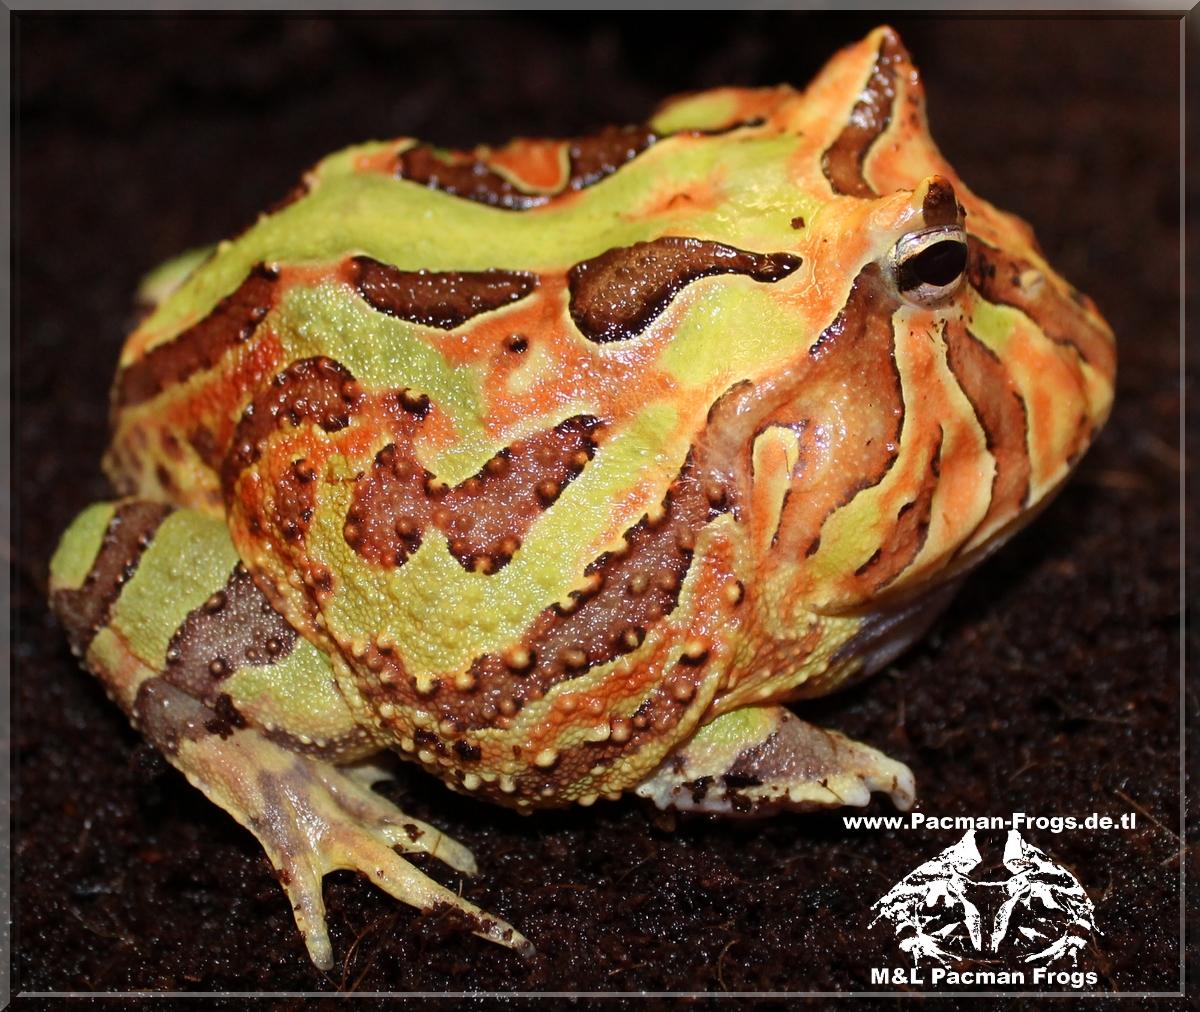 Fantasy Pacman Frog - cranwelli X cornuta